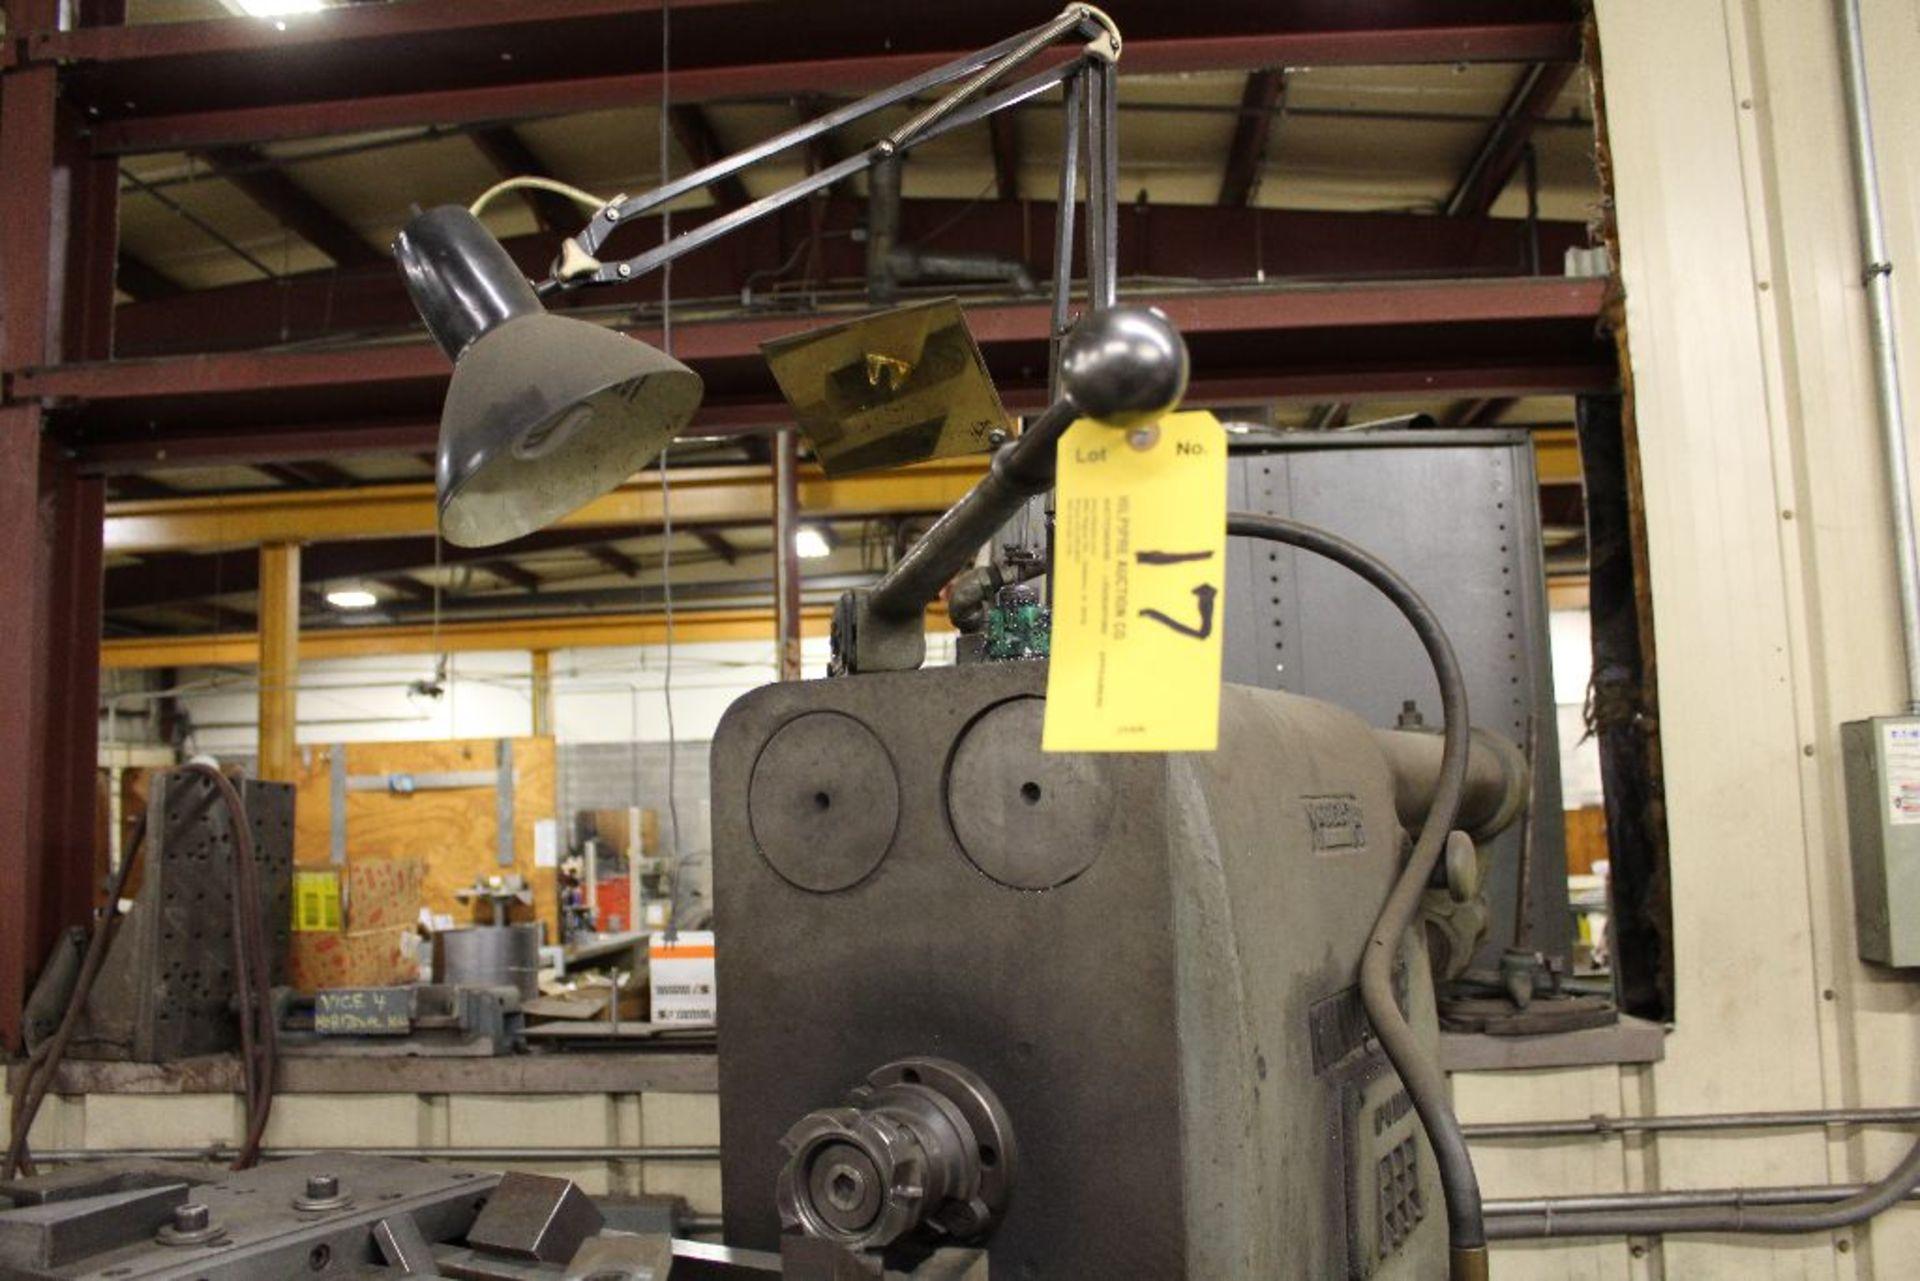 "Lot 017 - K & T No. 3 horizontal milling machine, model 315, sn 5-8007, 64"", 15 hp."